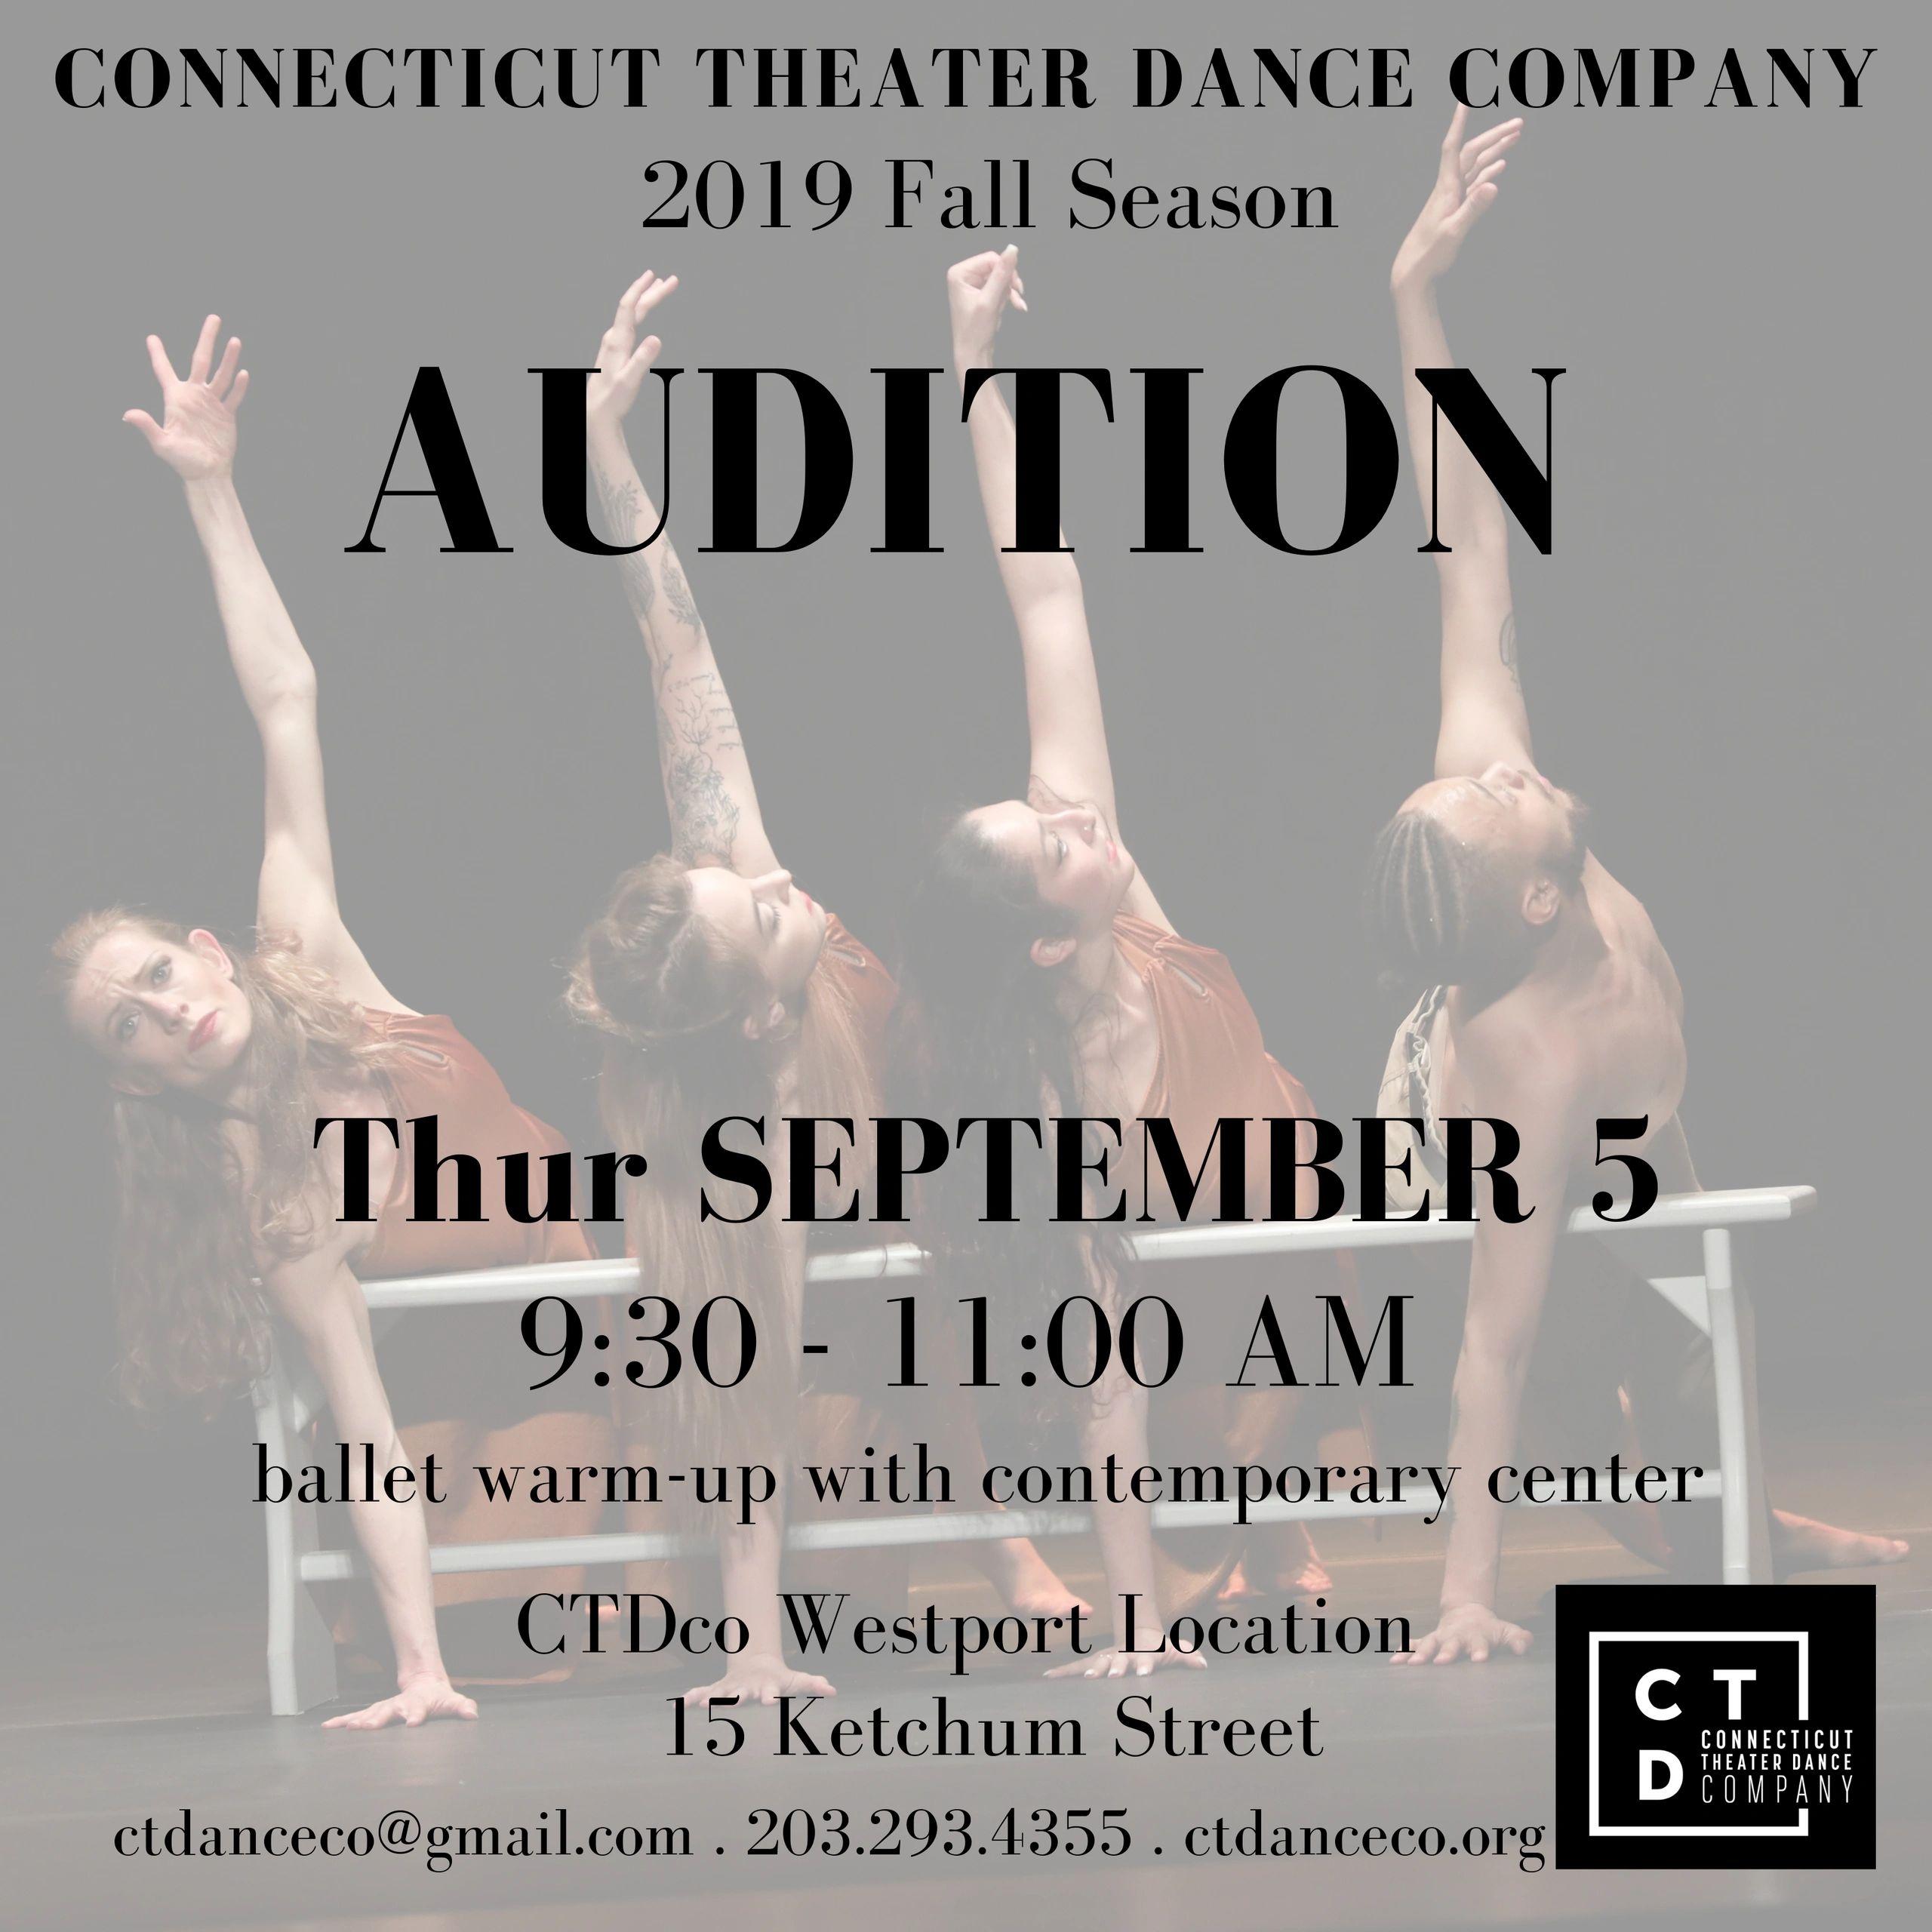 melange 2019 | CT Theater Dance Company